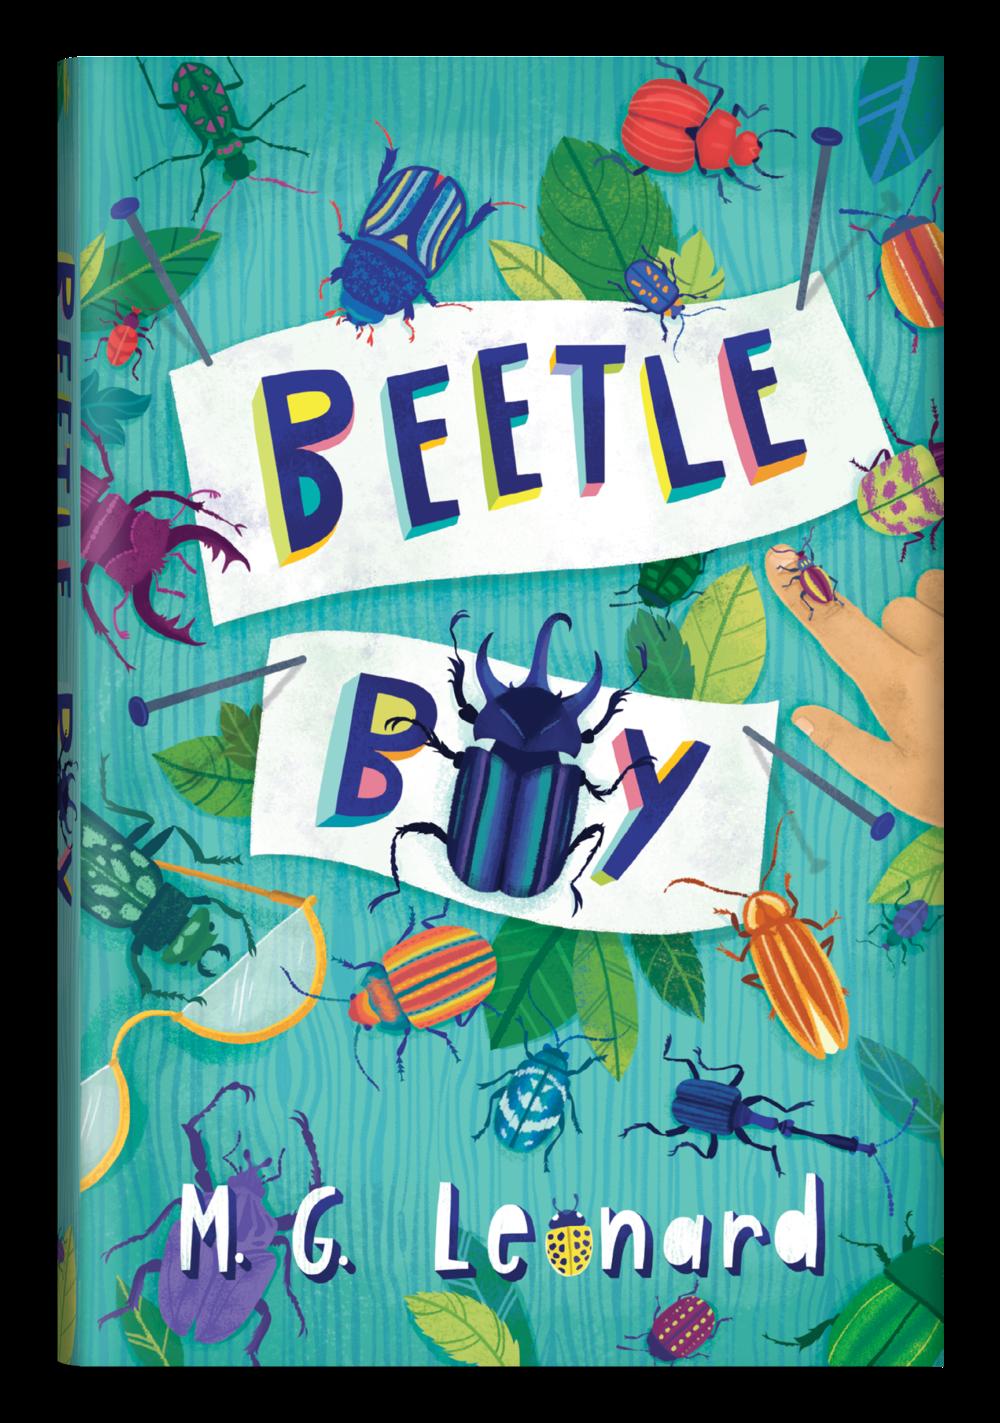 beetleboypb_front.png